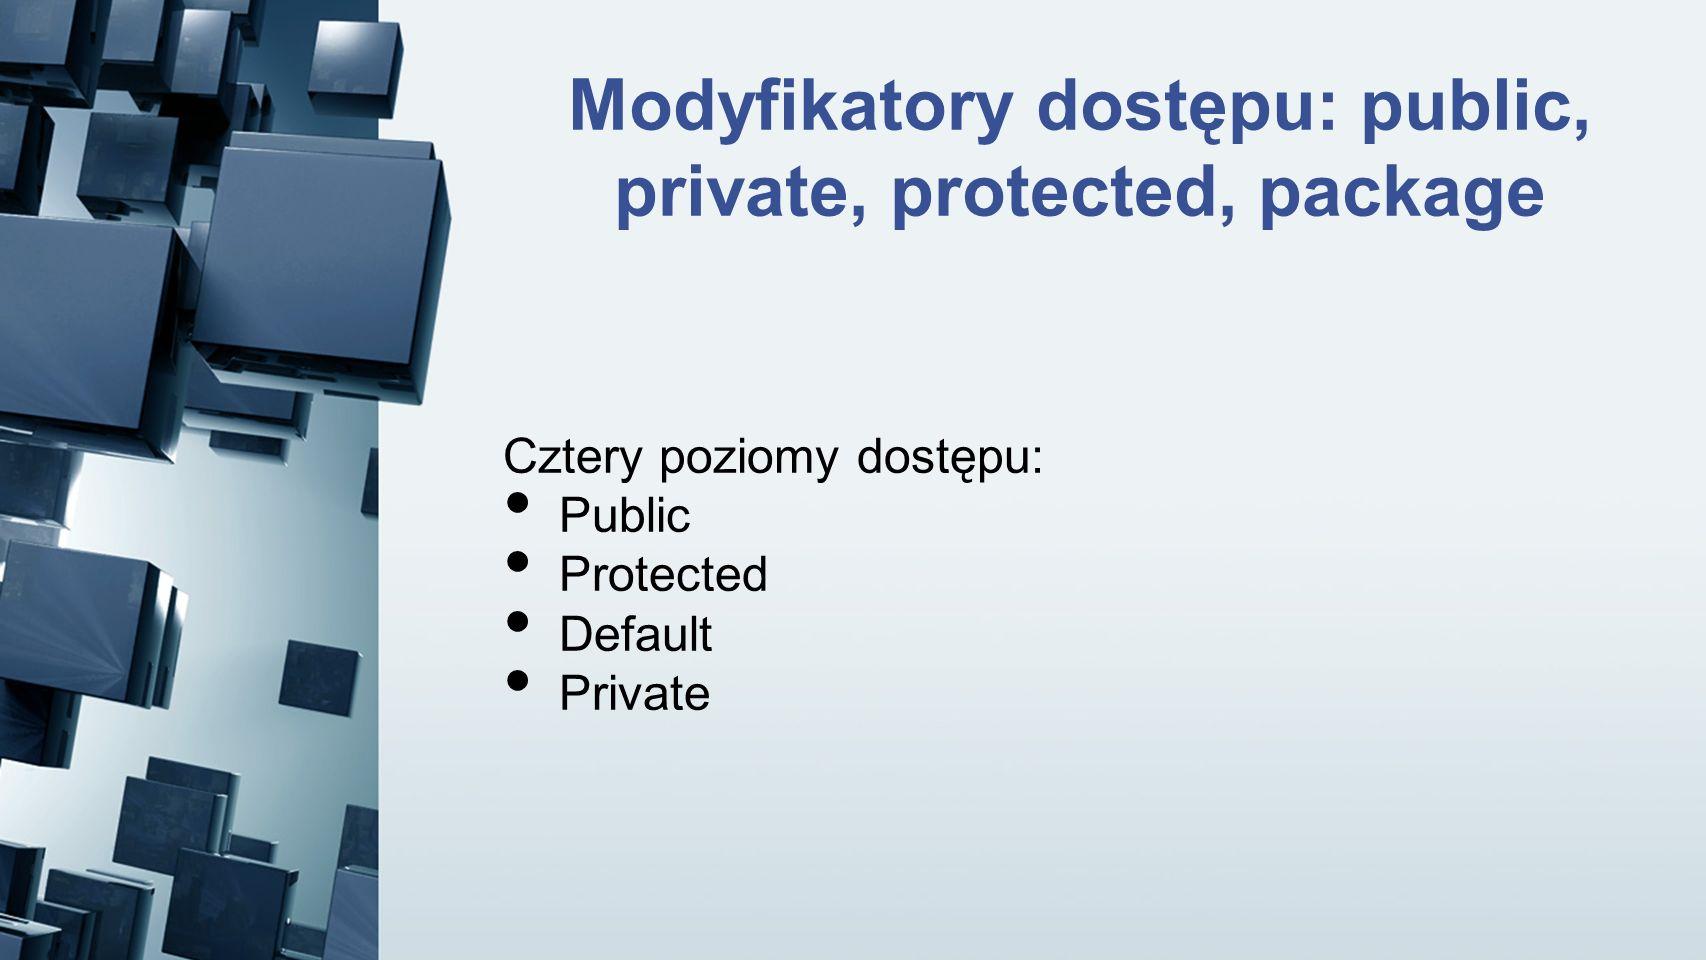 Modyfikatory dostępu: public, private, protected, package Cztery poziomy dostępu: Public Protected Default Private